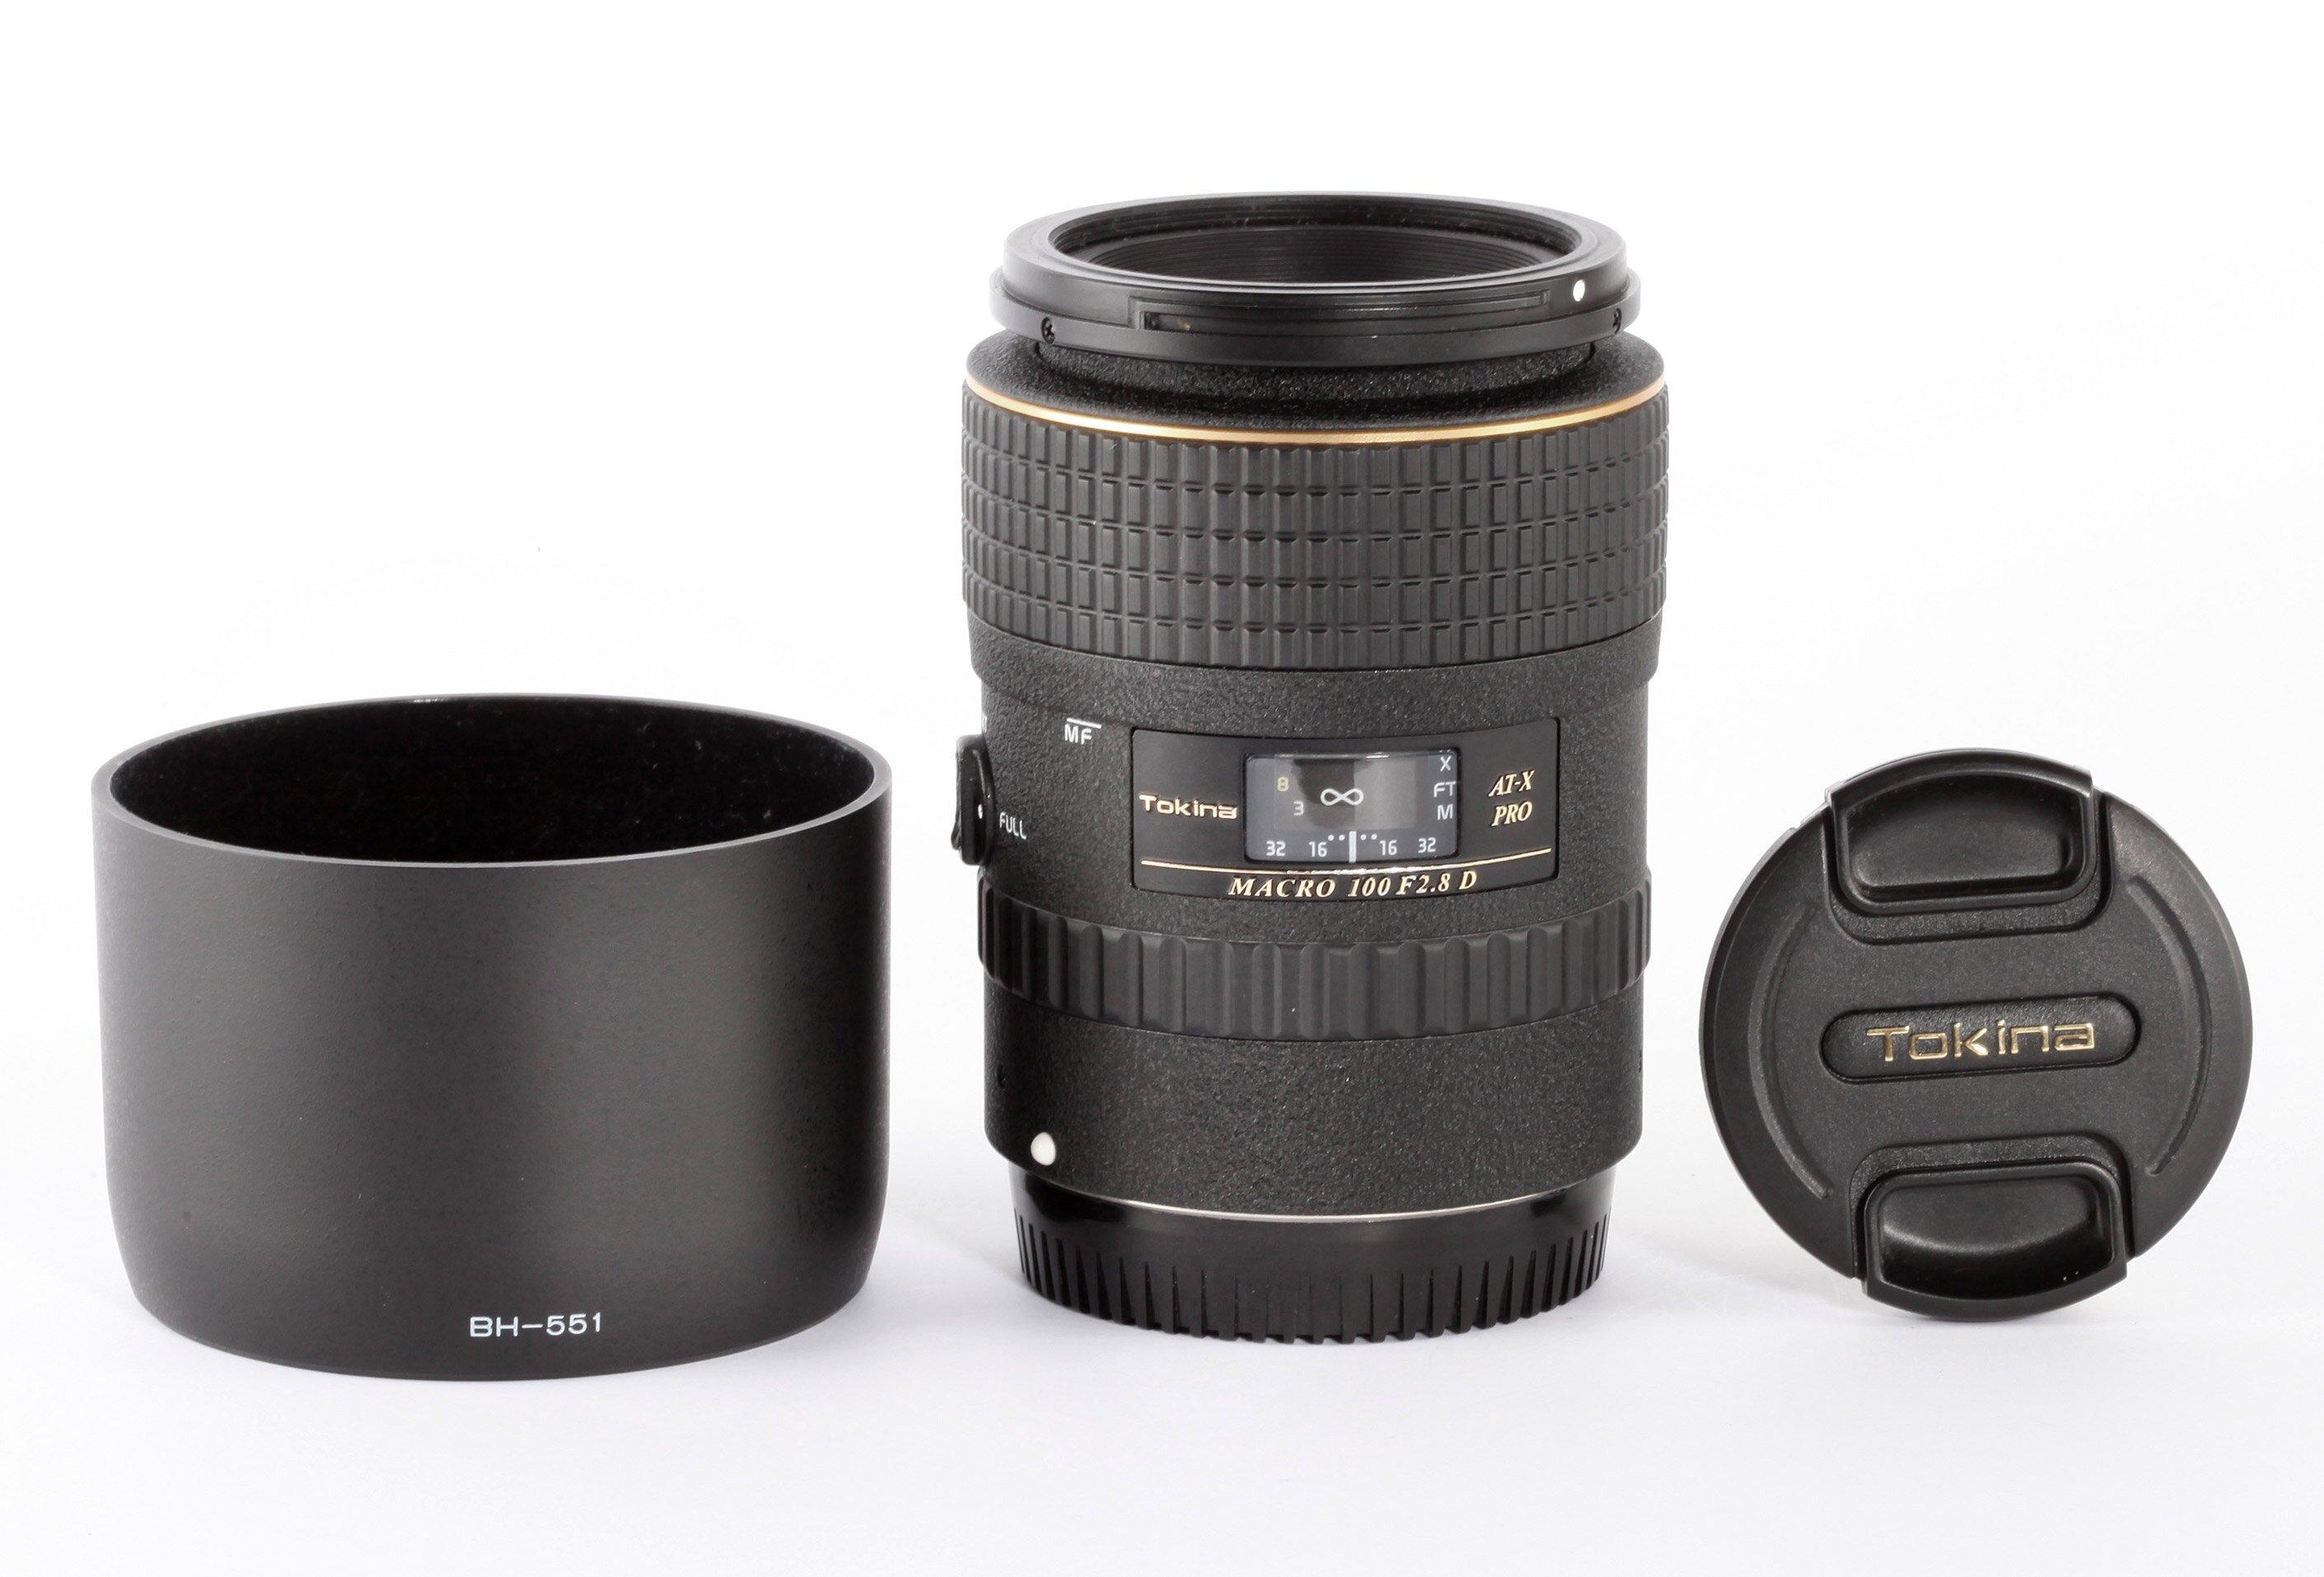 Tokina Makro 100mm/2,8 D f.Canon EOS